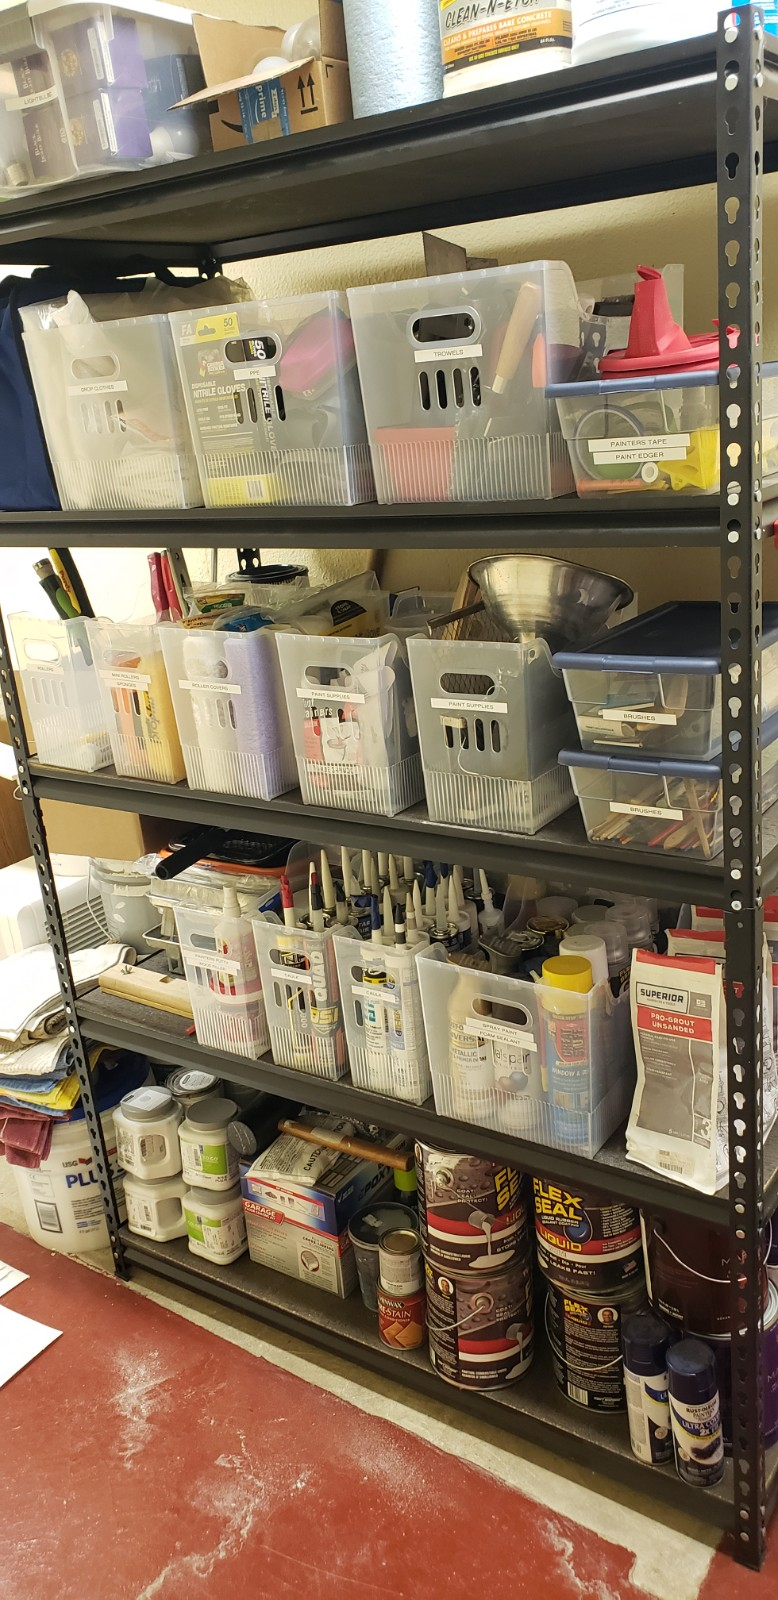 Painting/Tool Organization